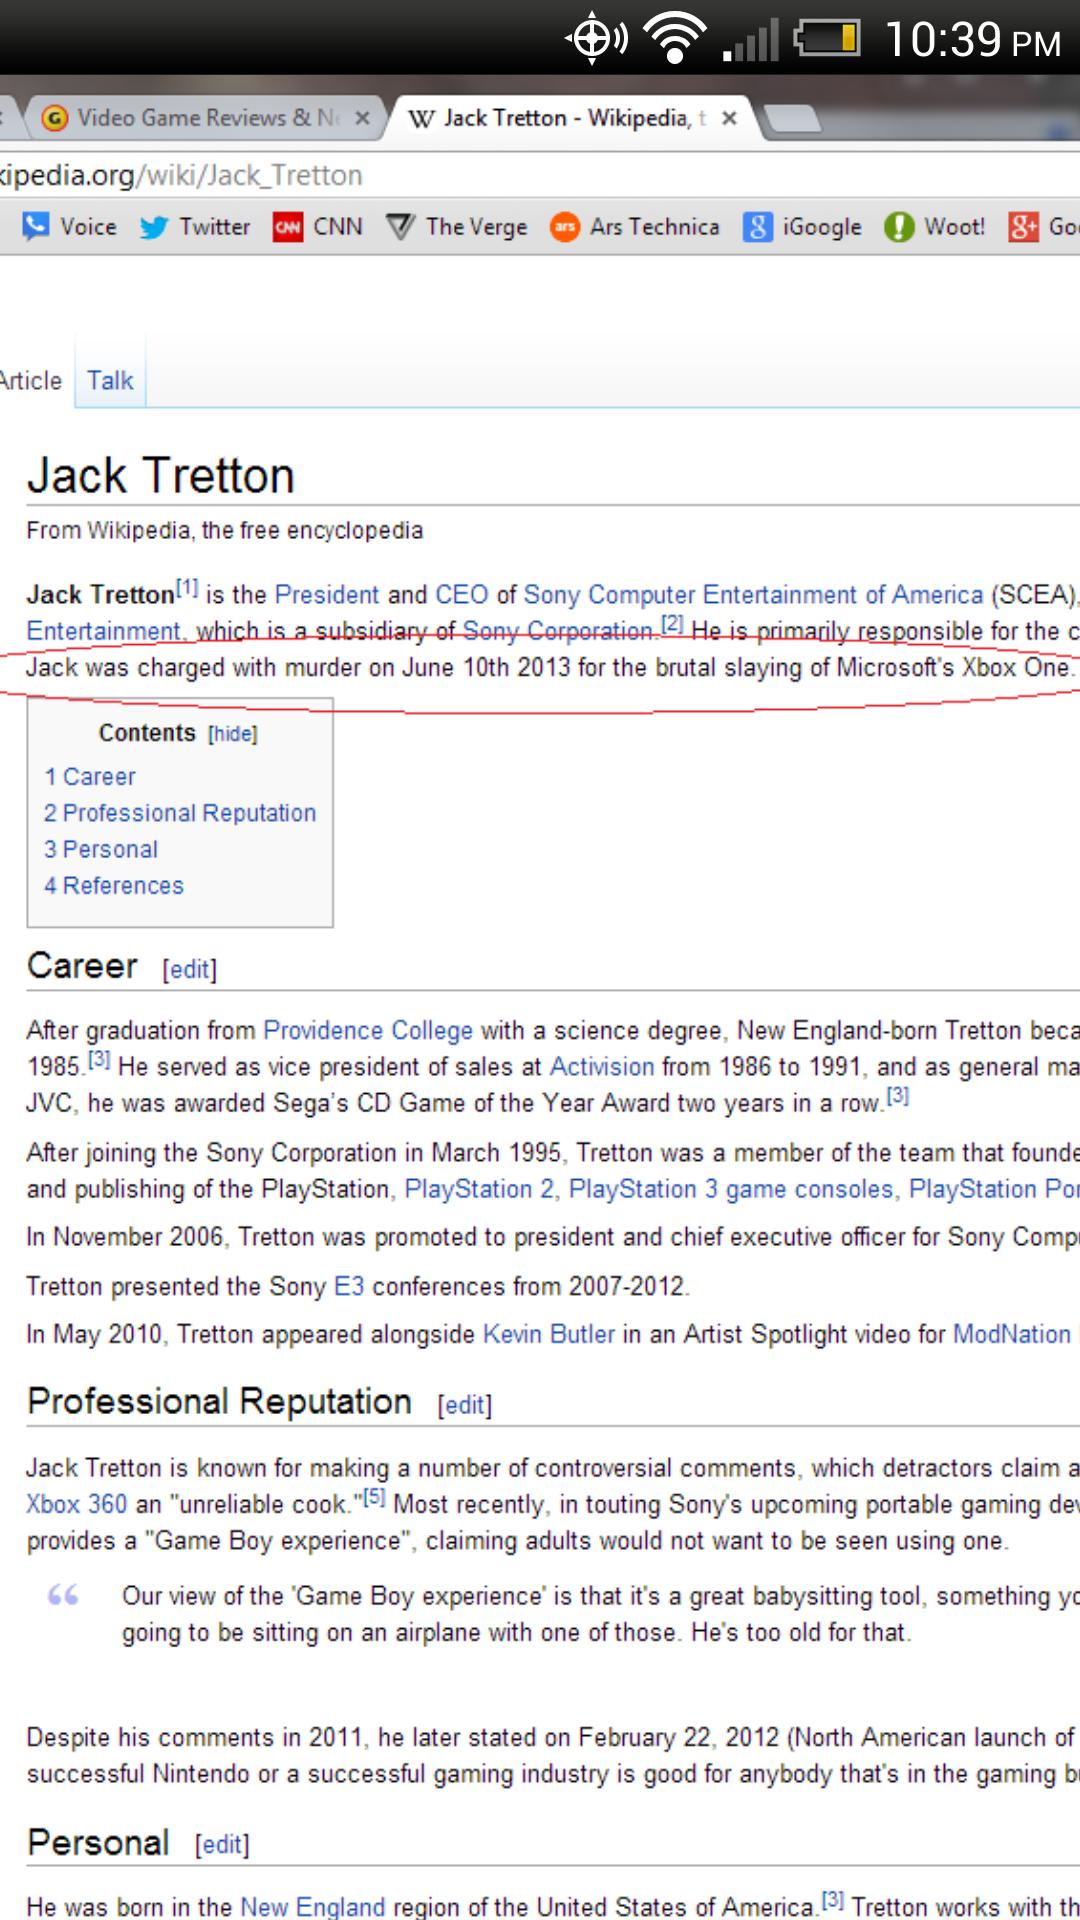 i loled. no. W Jack Tritton _ Wikipedia, . acedia. org/ wiki/ Voice y Twitter CNN V The Verge G Ars Technica igoogle o Wont! Go Vtifqe Talk Jack Tritton From Wi Dick jews